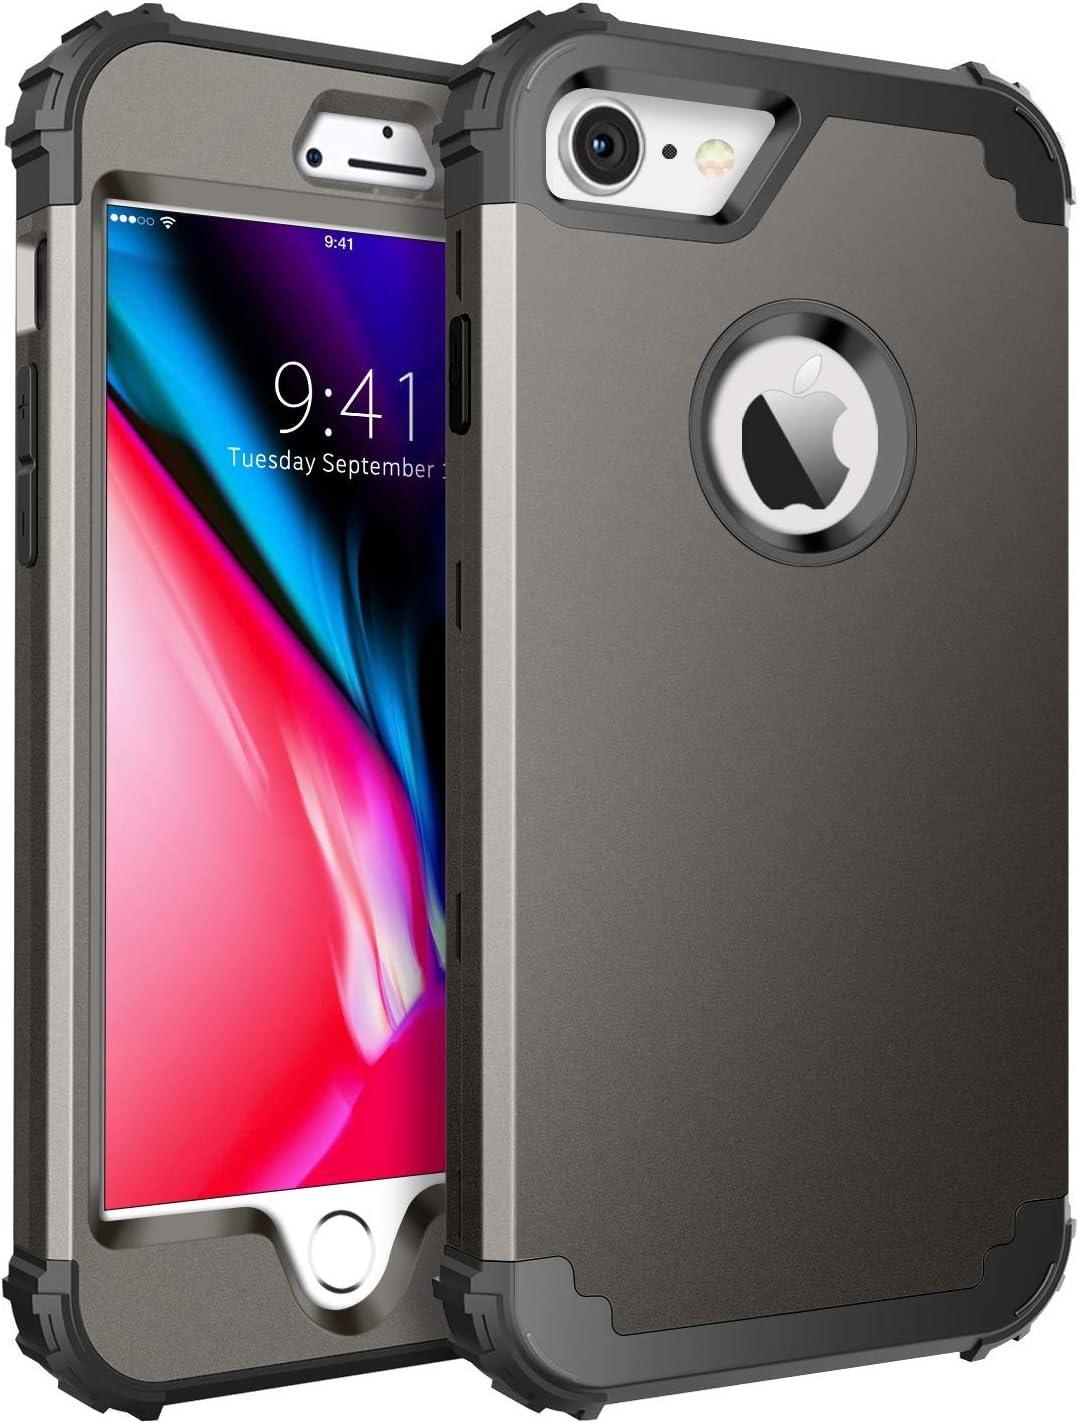 Funda protectora BENTOBEN para iPhone 8 /iPhone 7 4.7 -DGNB